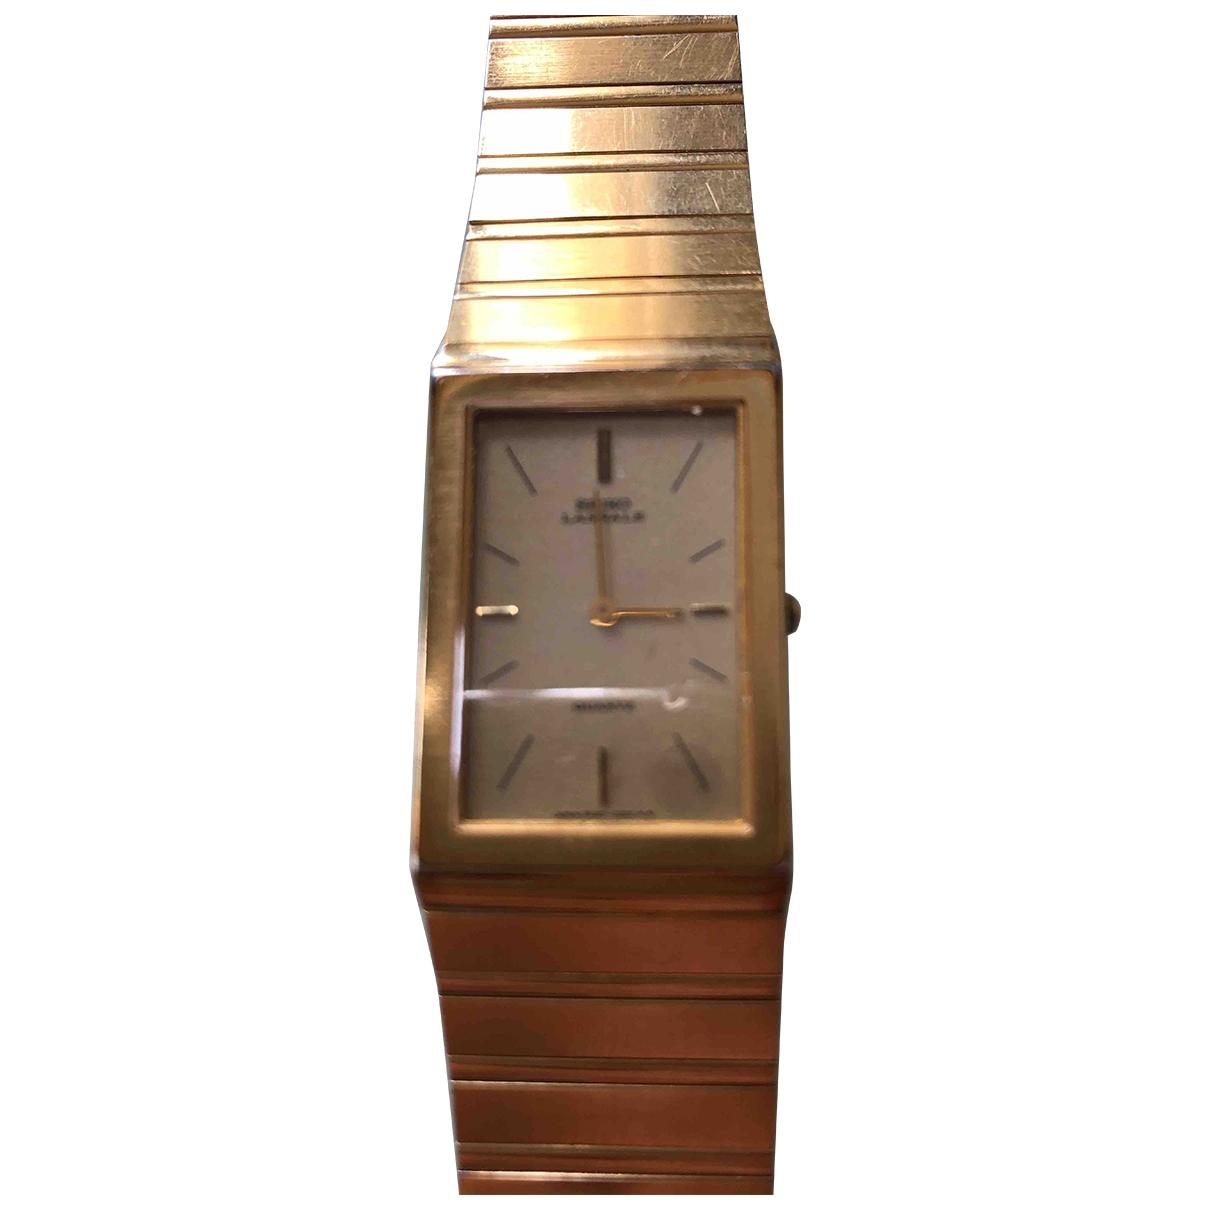 Seiko \N Uhr in  Gold Stahl